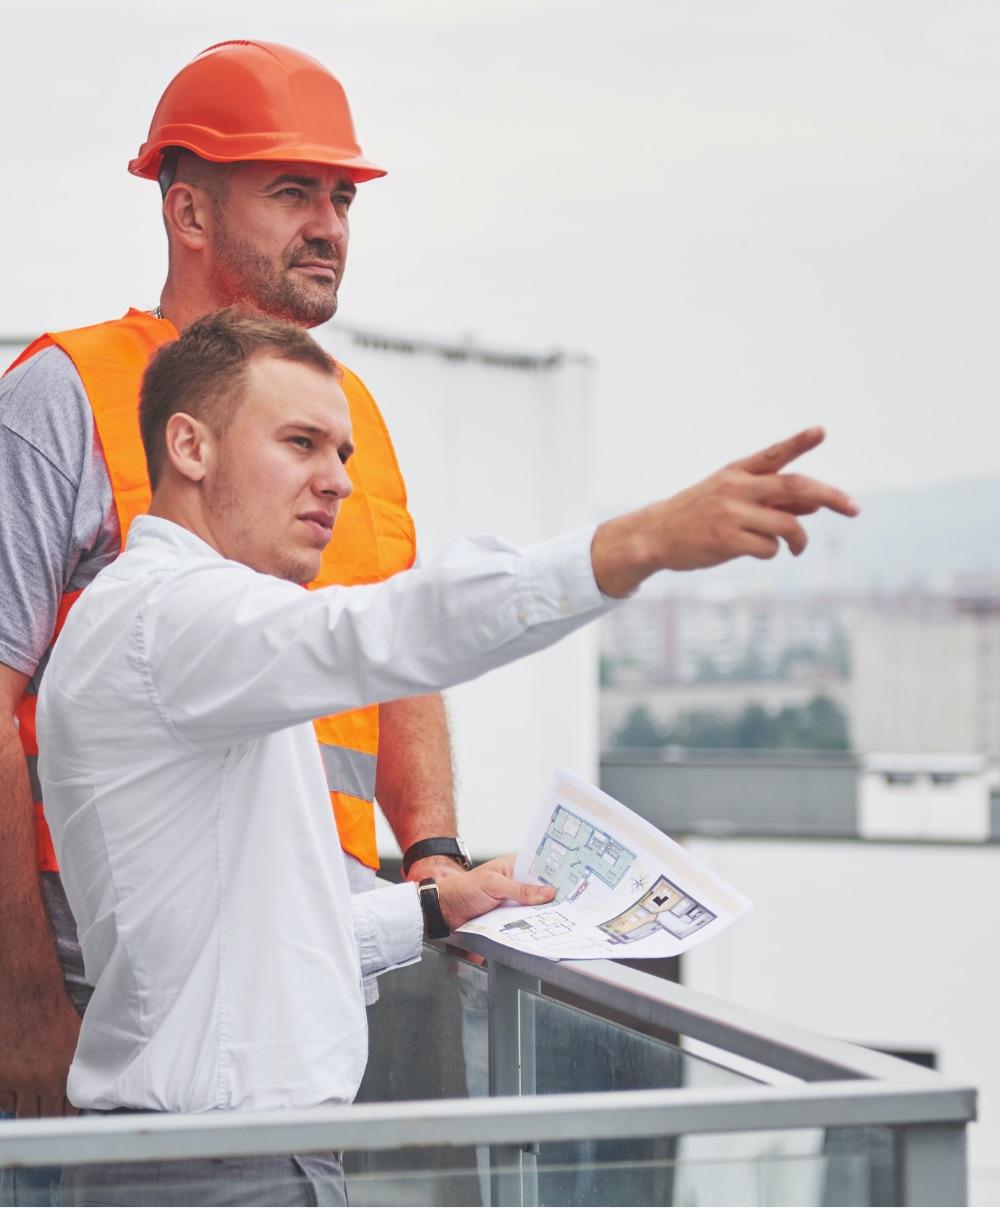 ProRisk Safety Management Limited